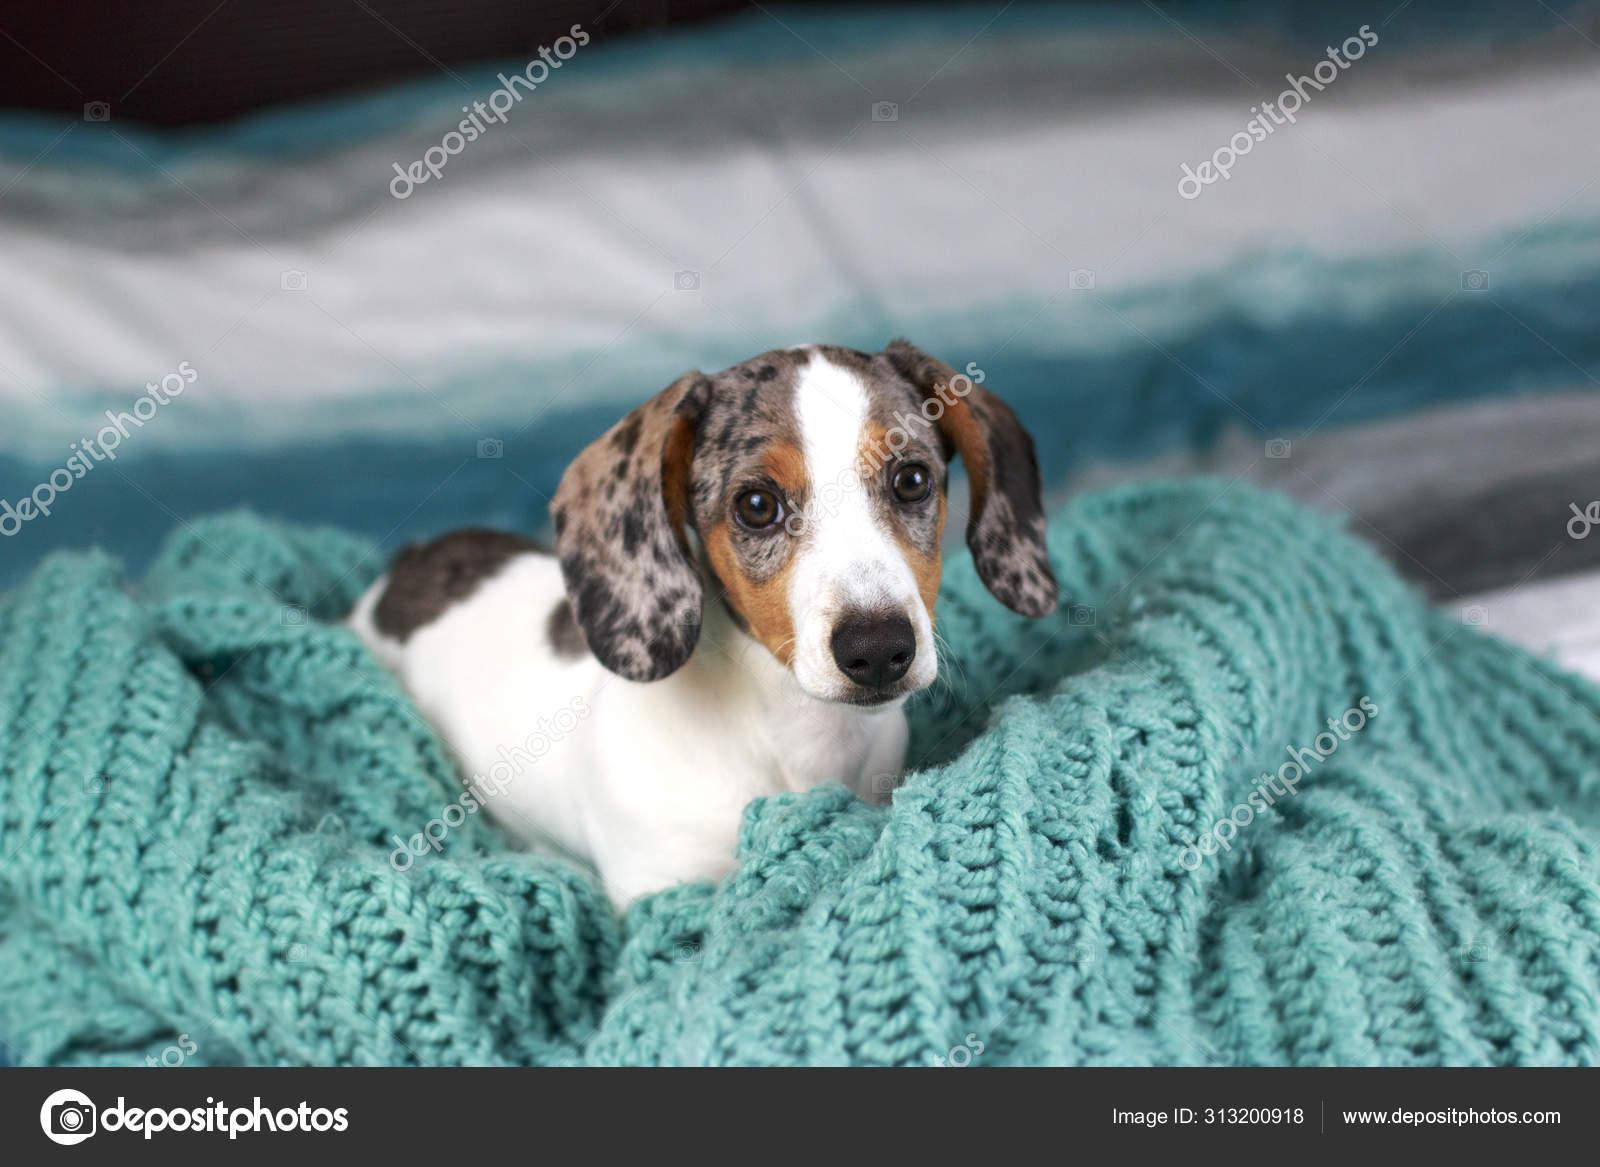 Cute Little Dachshund Puppy Dog Laying His Blue Cozy Blanket Stock Photo C Miriamstockphotos 313200918